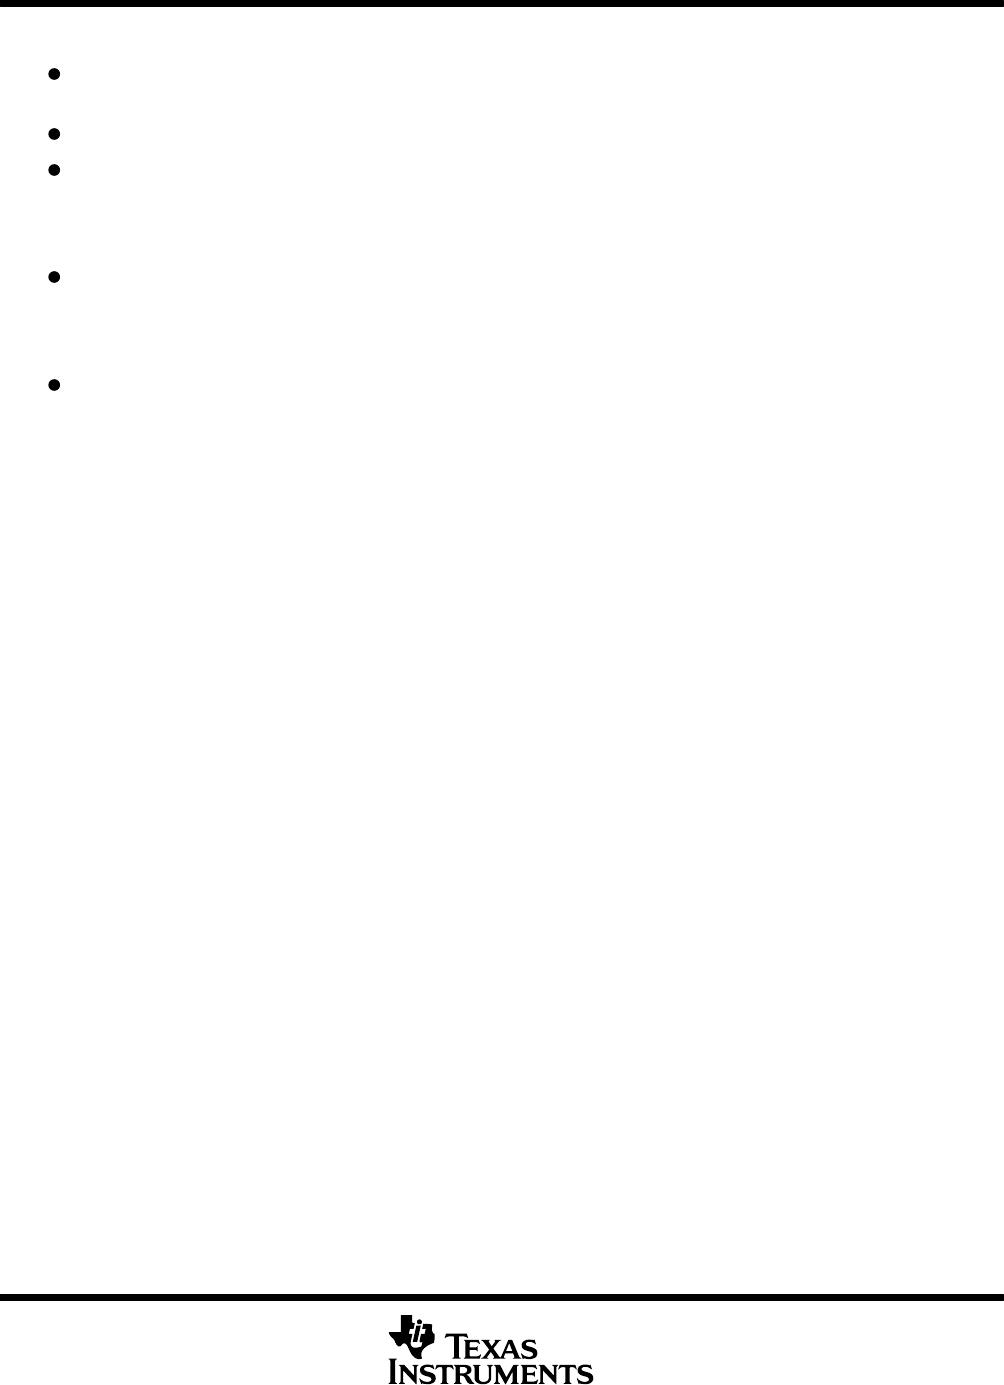 tlc4502acd pdf下载及第20页内容在线浏览